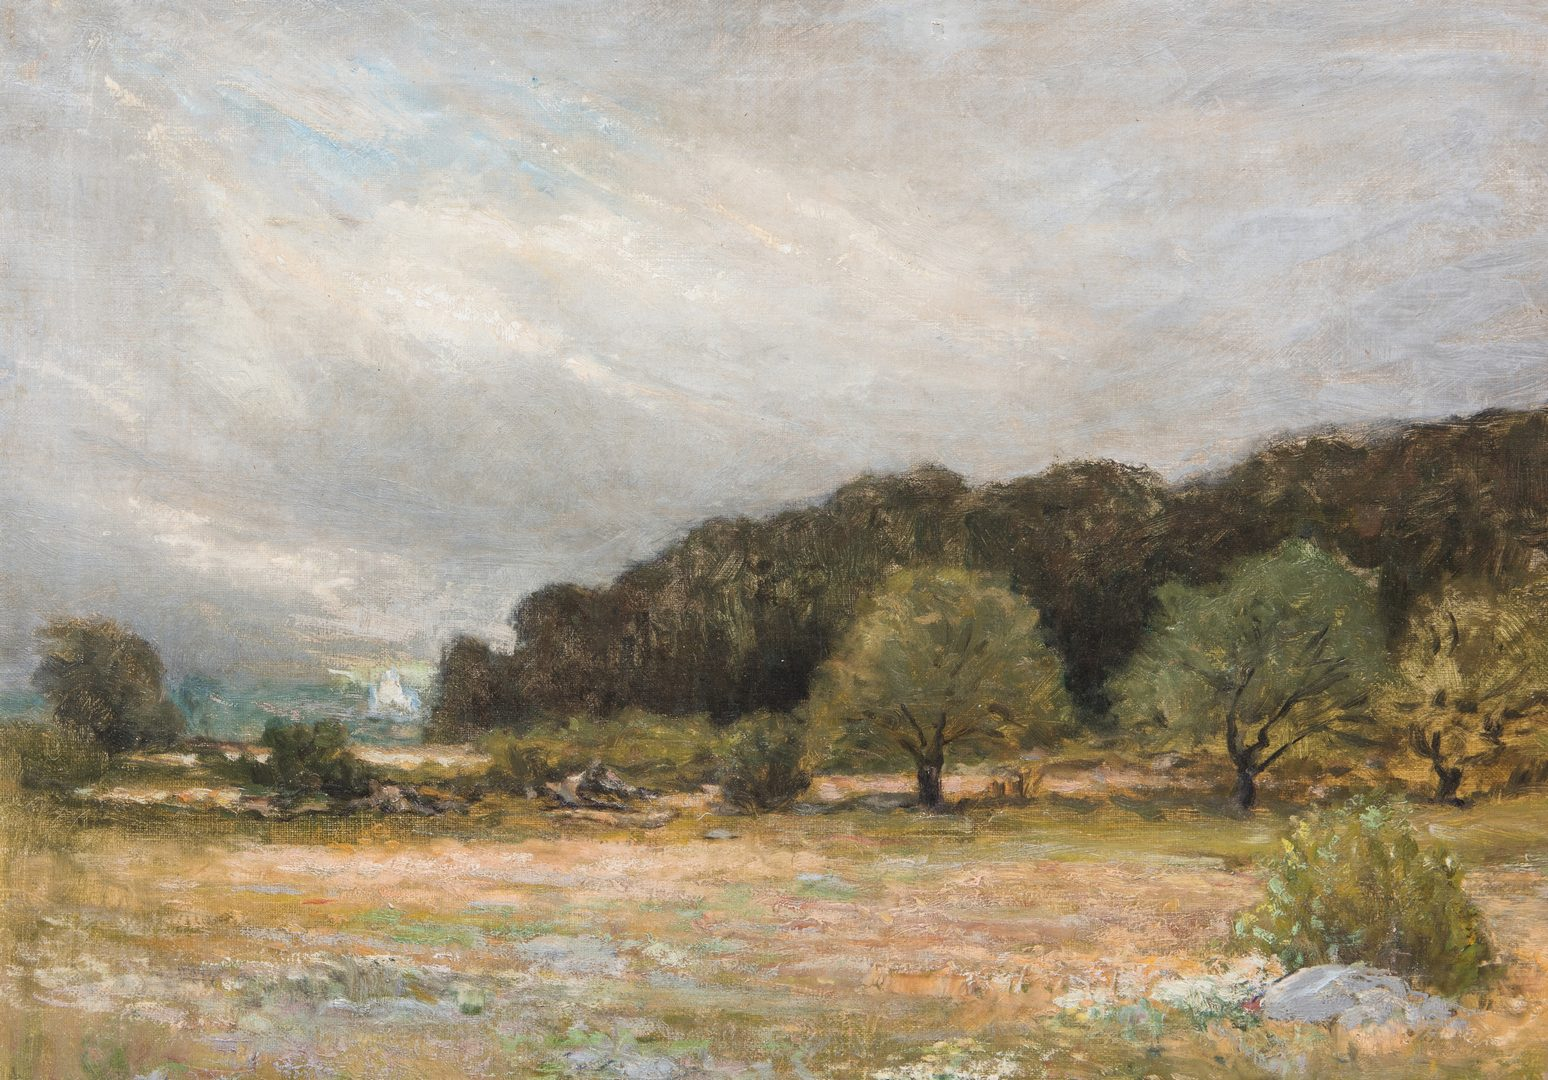 Lot 146: George W. Whitaker, O/C, Barbizon School Landscape